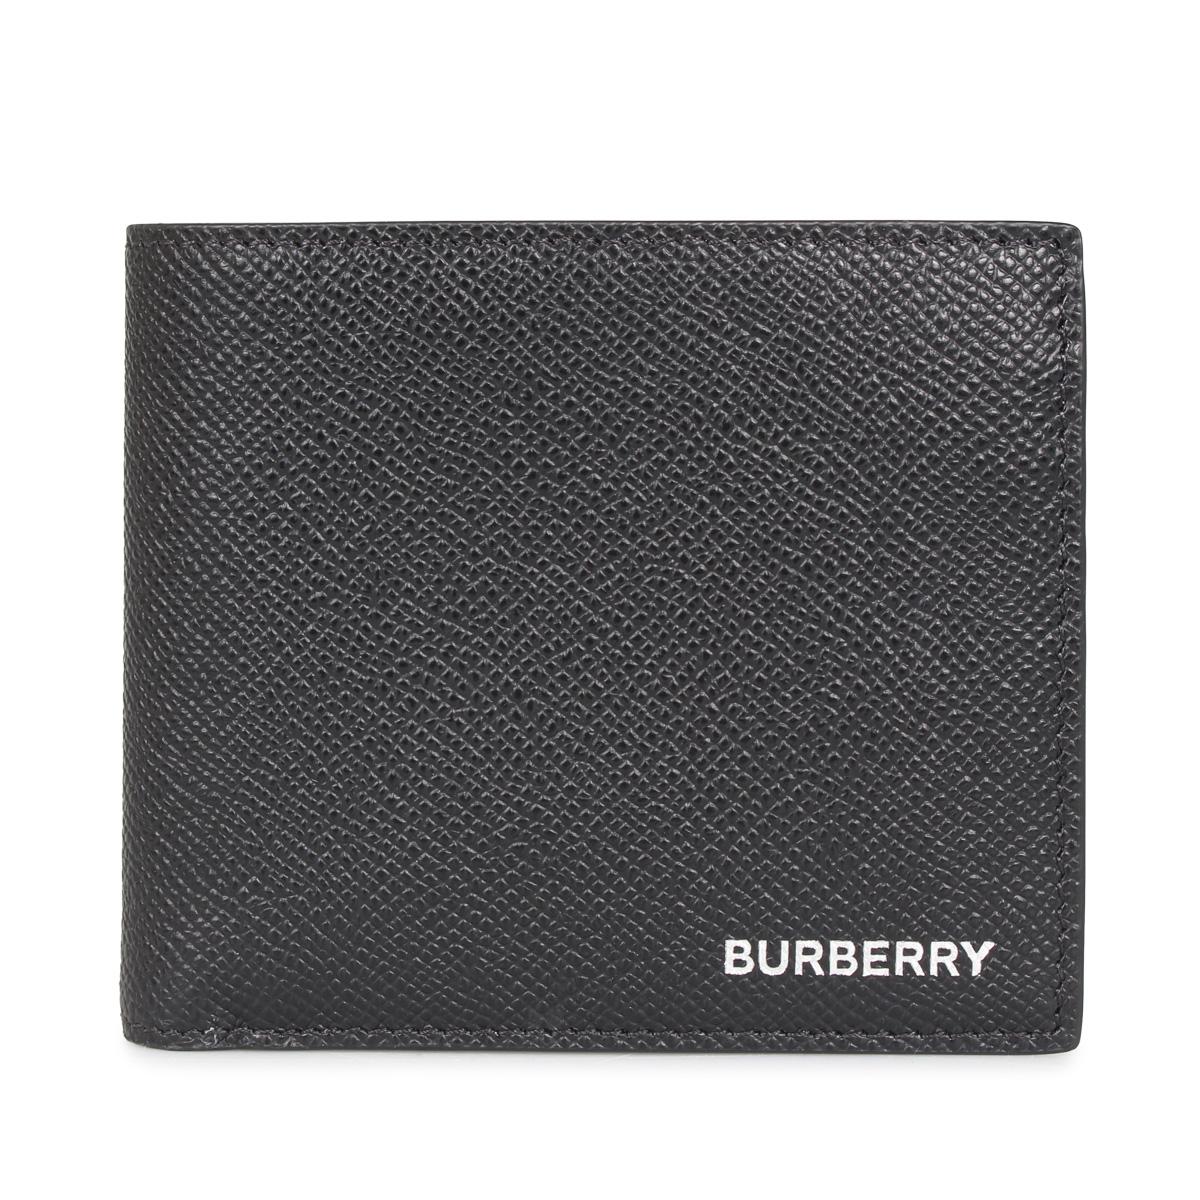 BURBERRY CC BILL COIN バーバリー 財布 二つ折り メンズ ブラック 黒 8014656